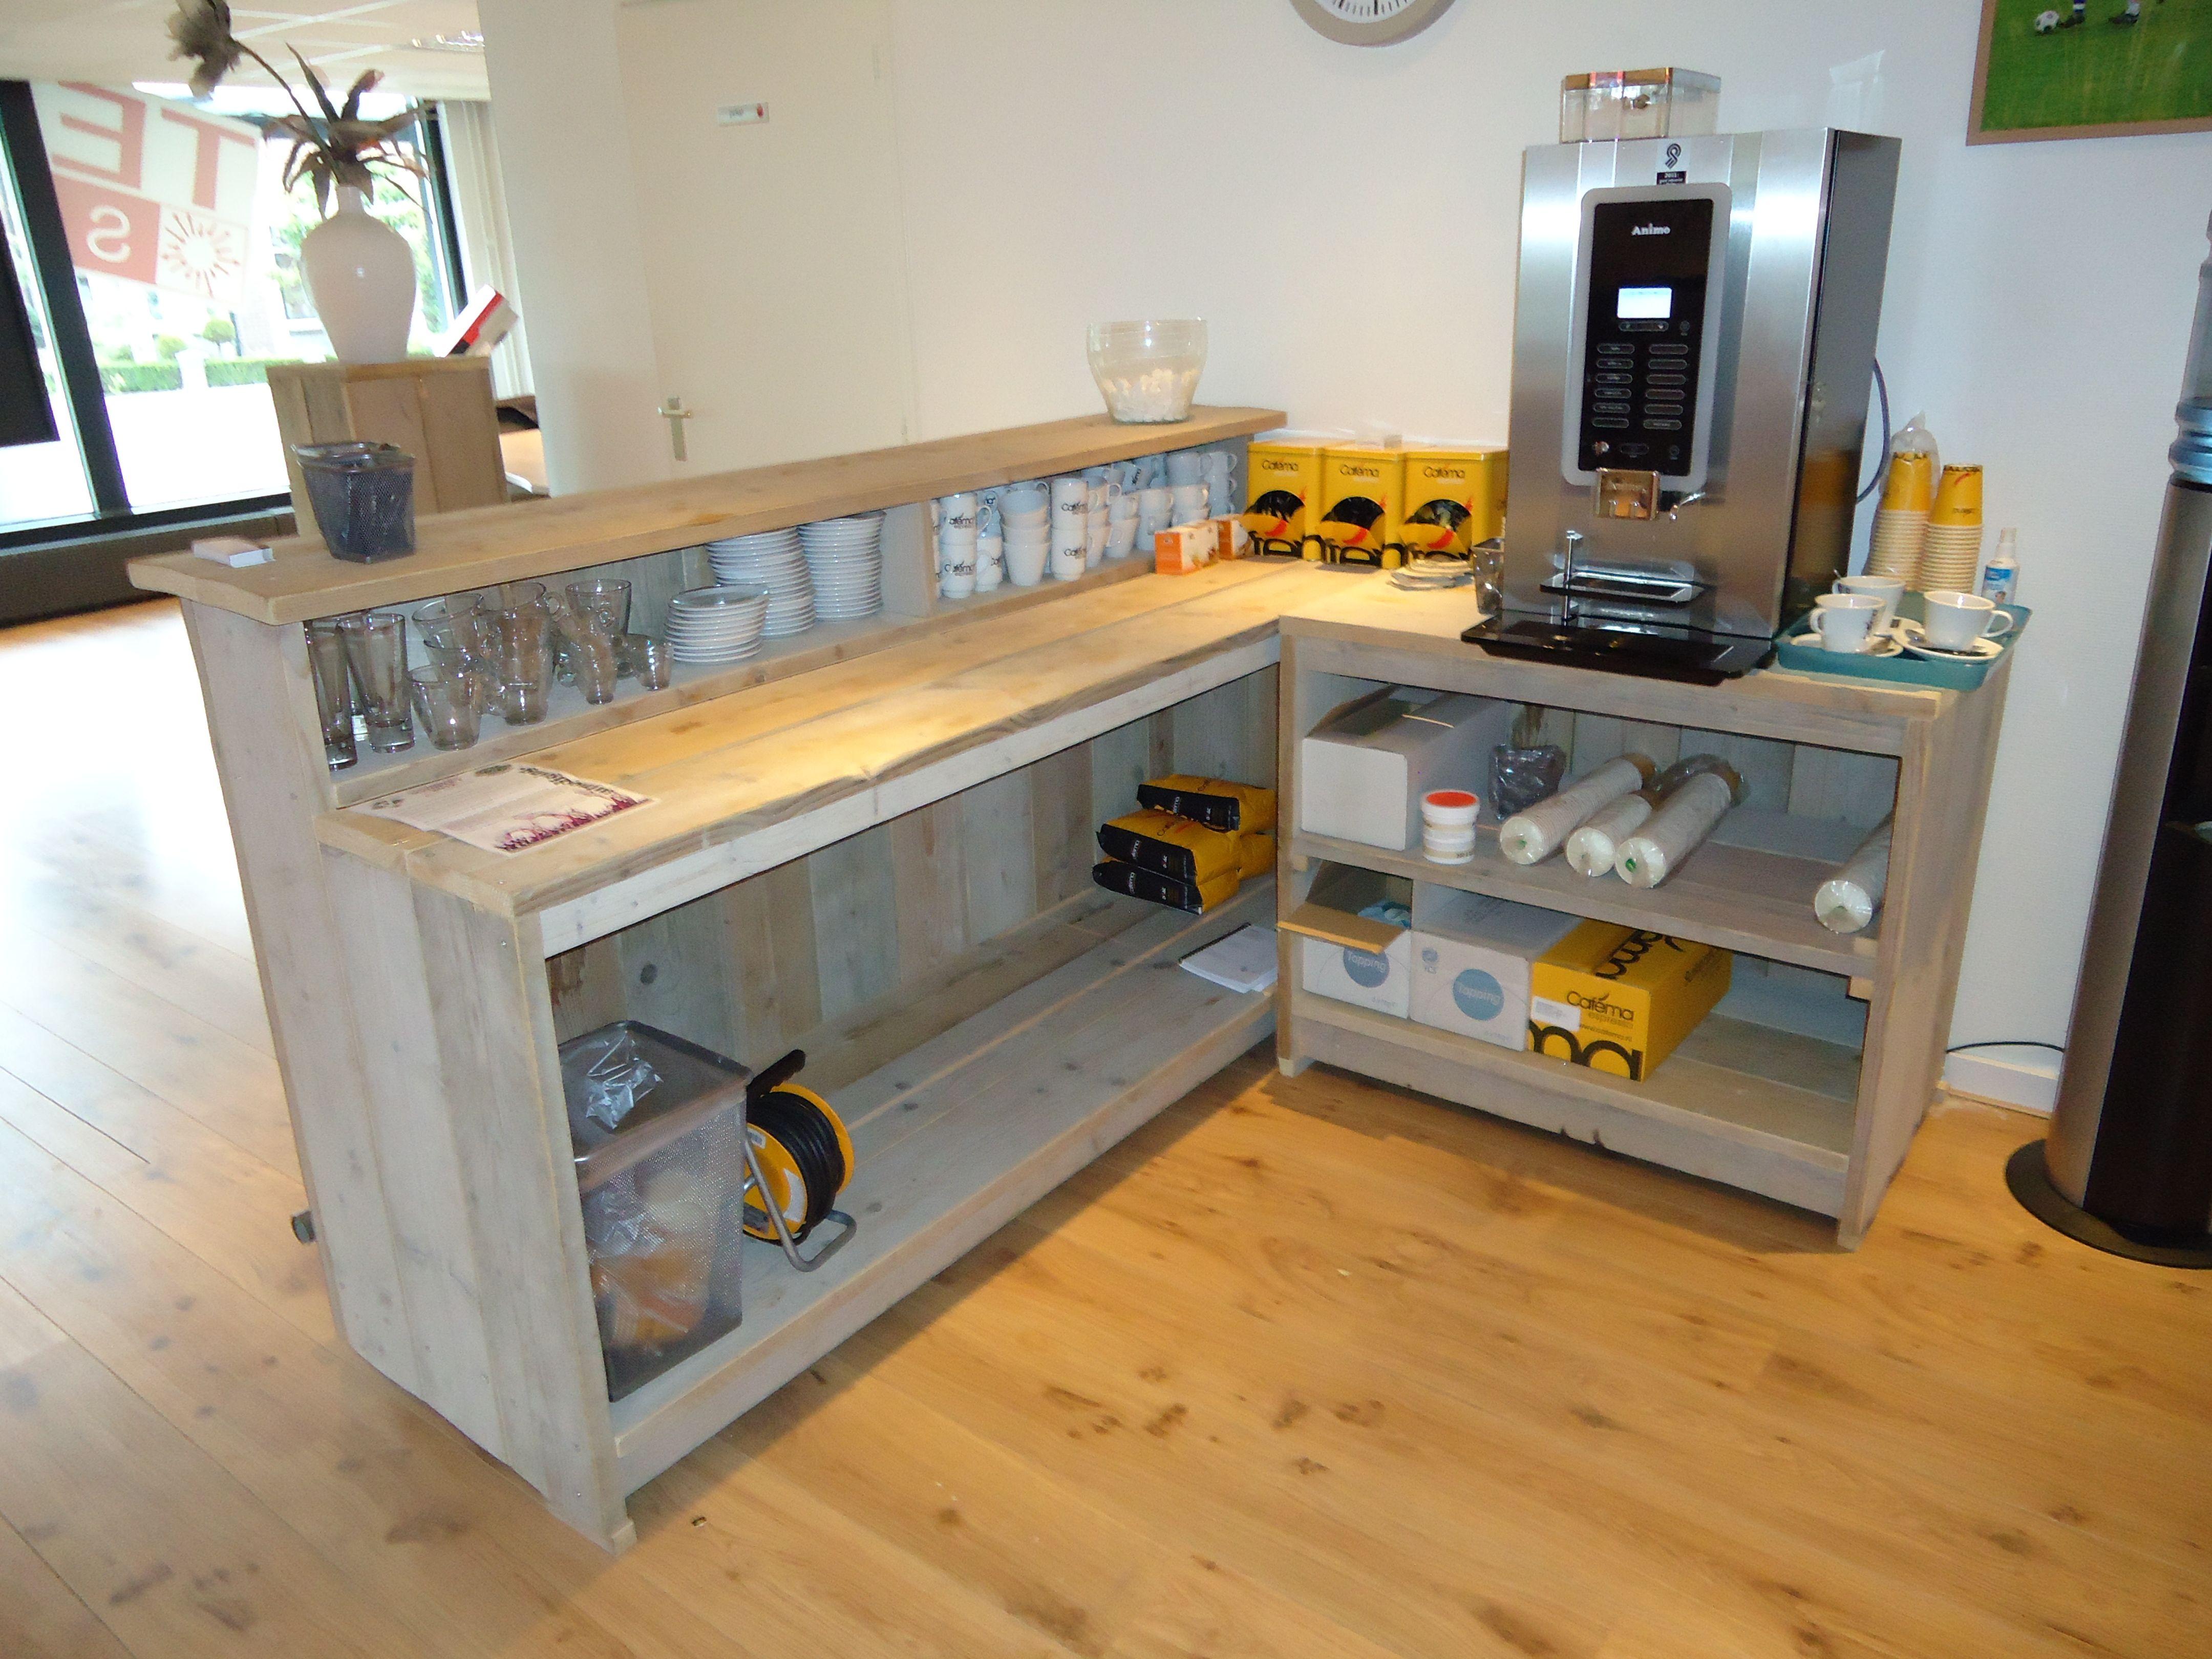 Steigerhout Bar Keuken : Steigerhouten bar google zoeken kelder in bar